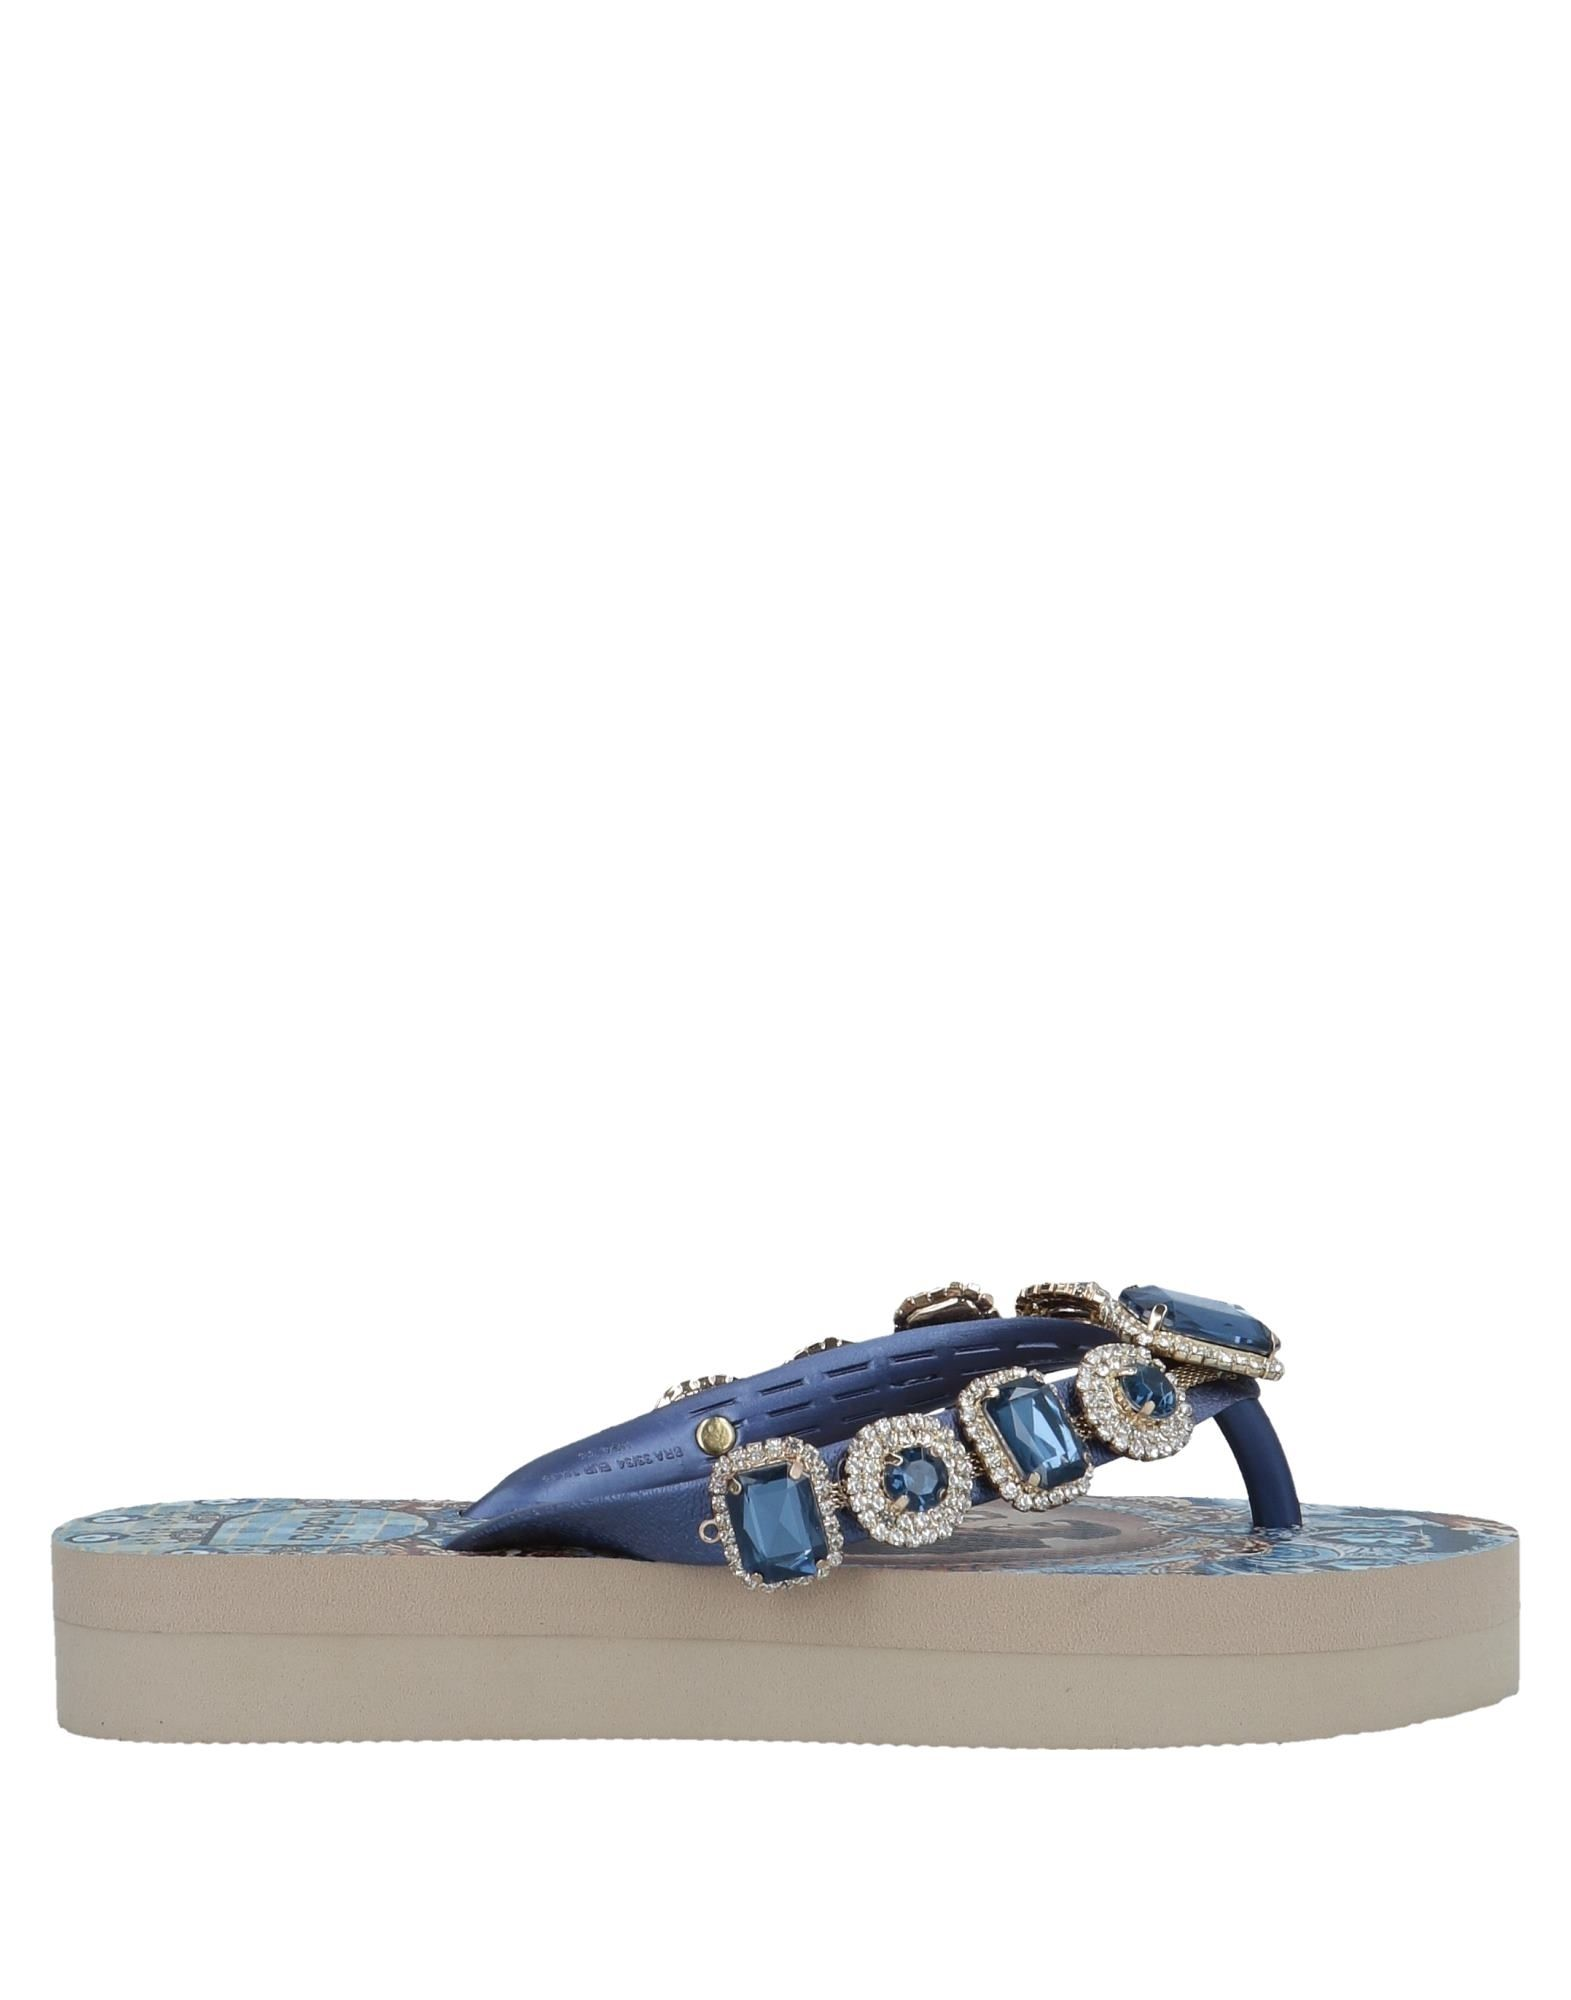 Indaia Flip Flops - Women Indaia Flip Flops - online on  Australia - Flops 11546372ER a3a7fe